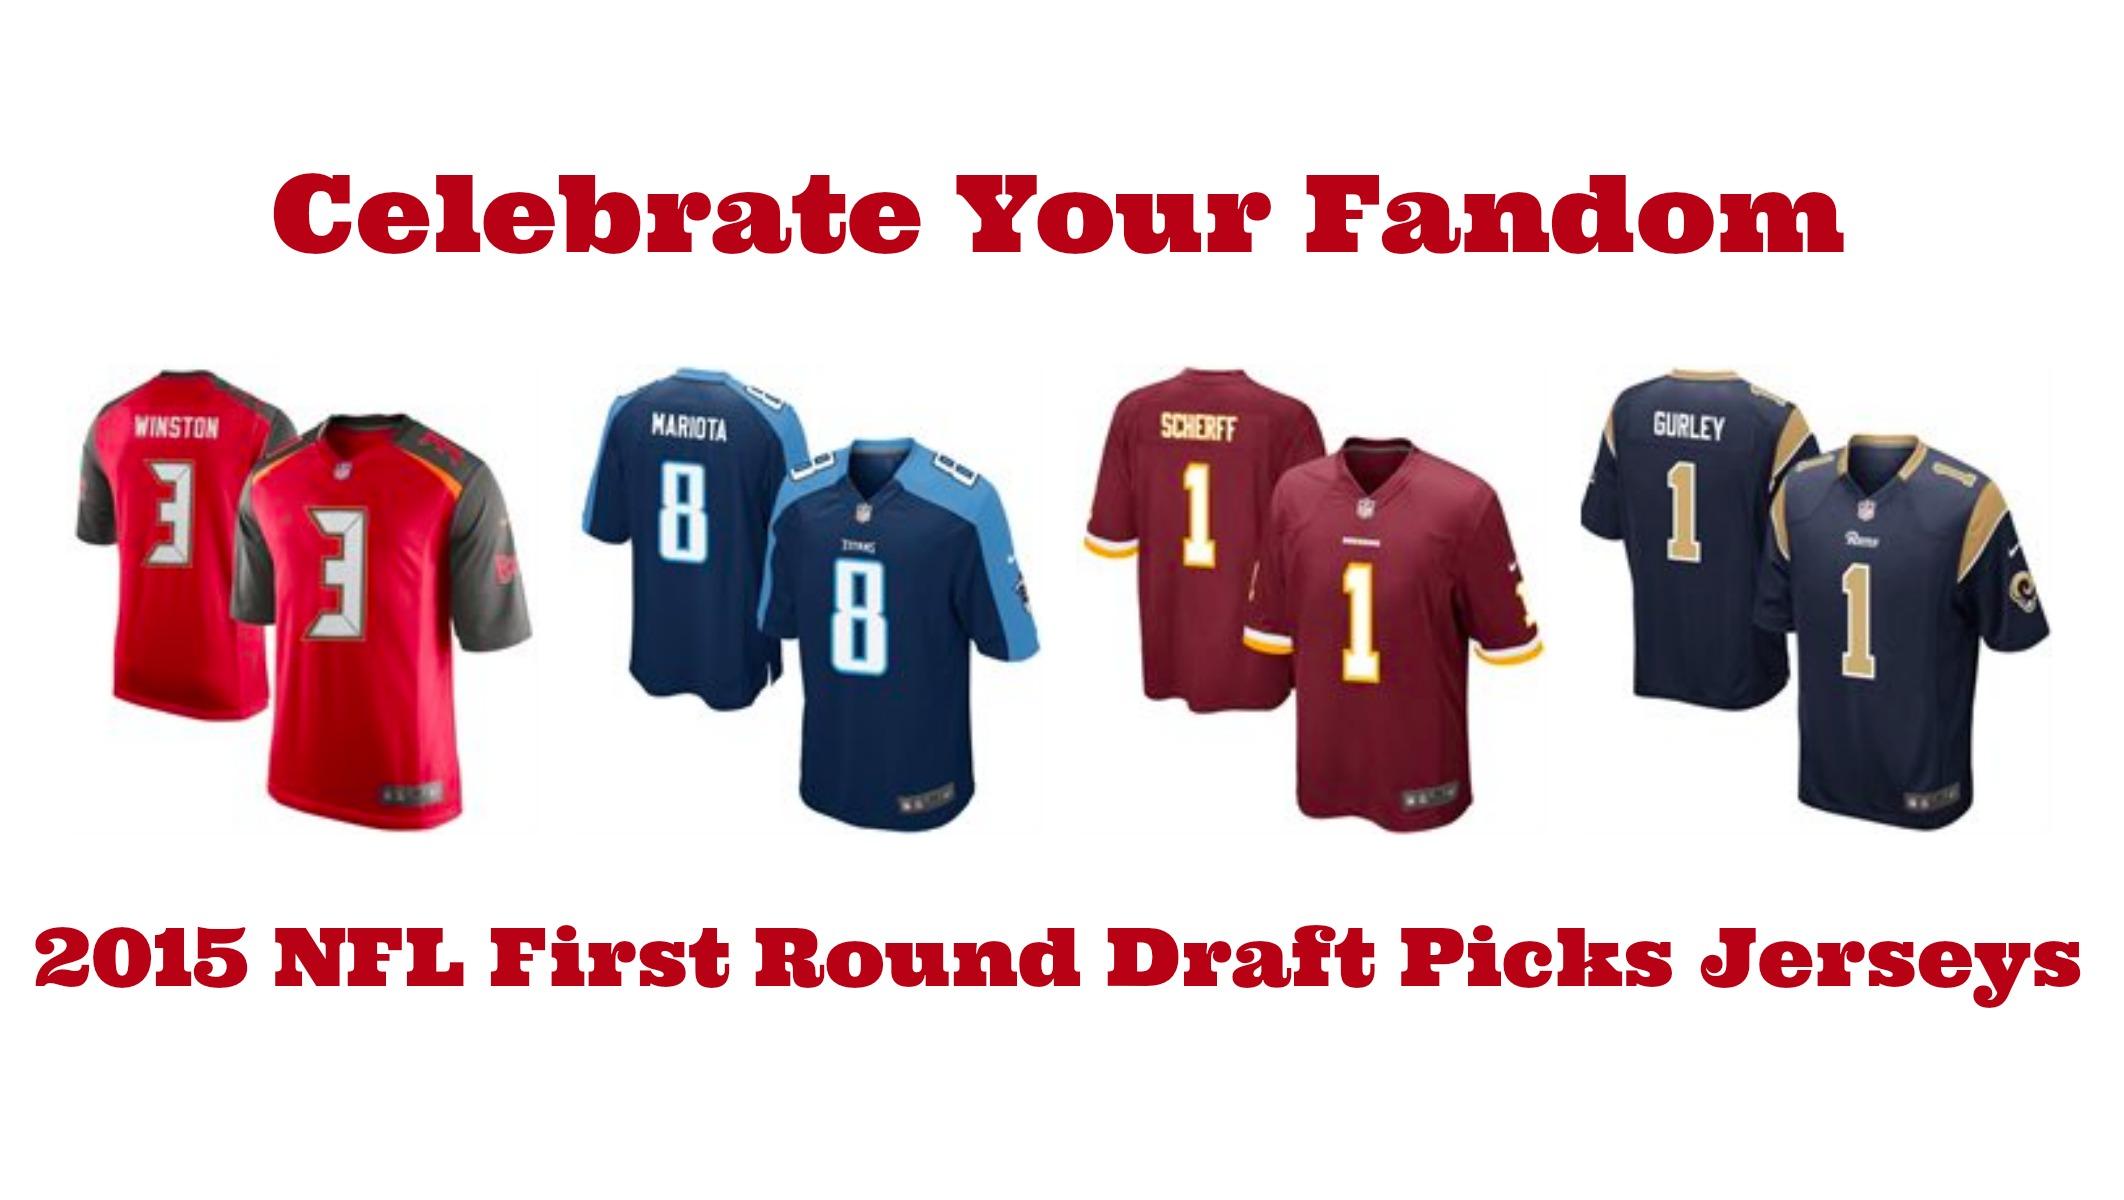 2015 NFL First Round Draft Picks Jerseys